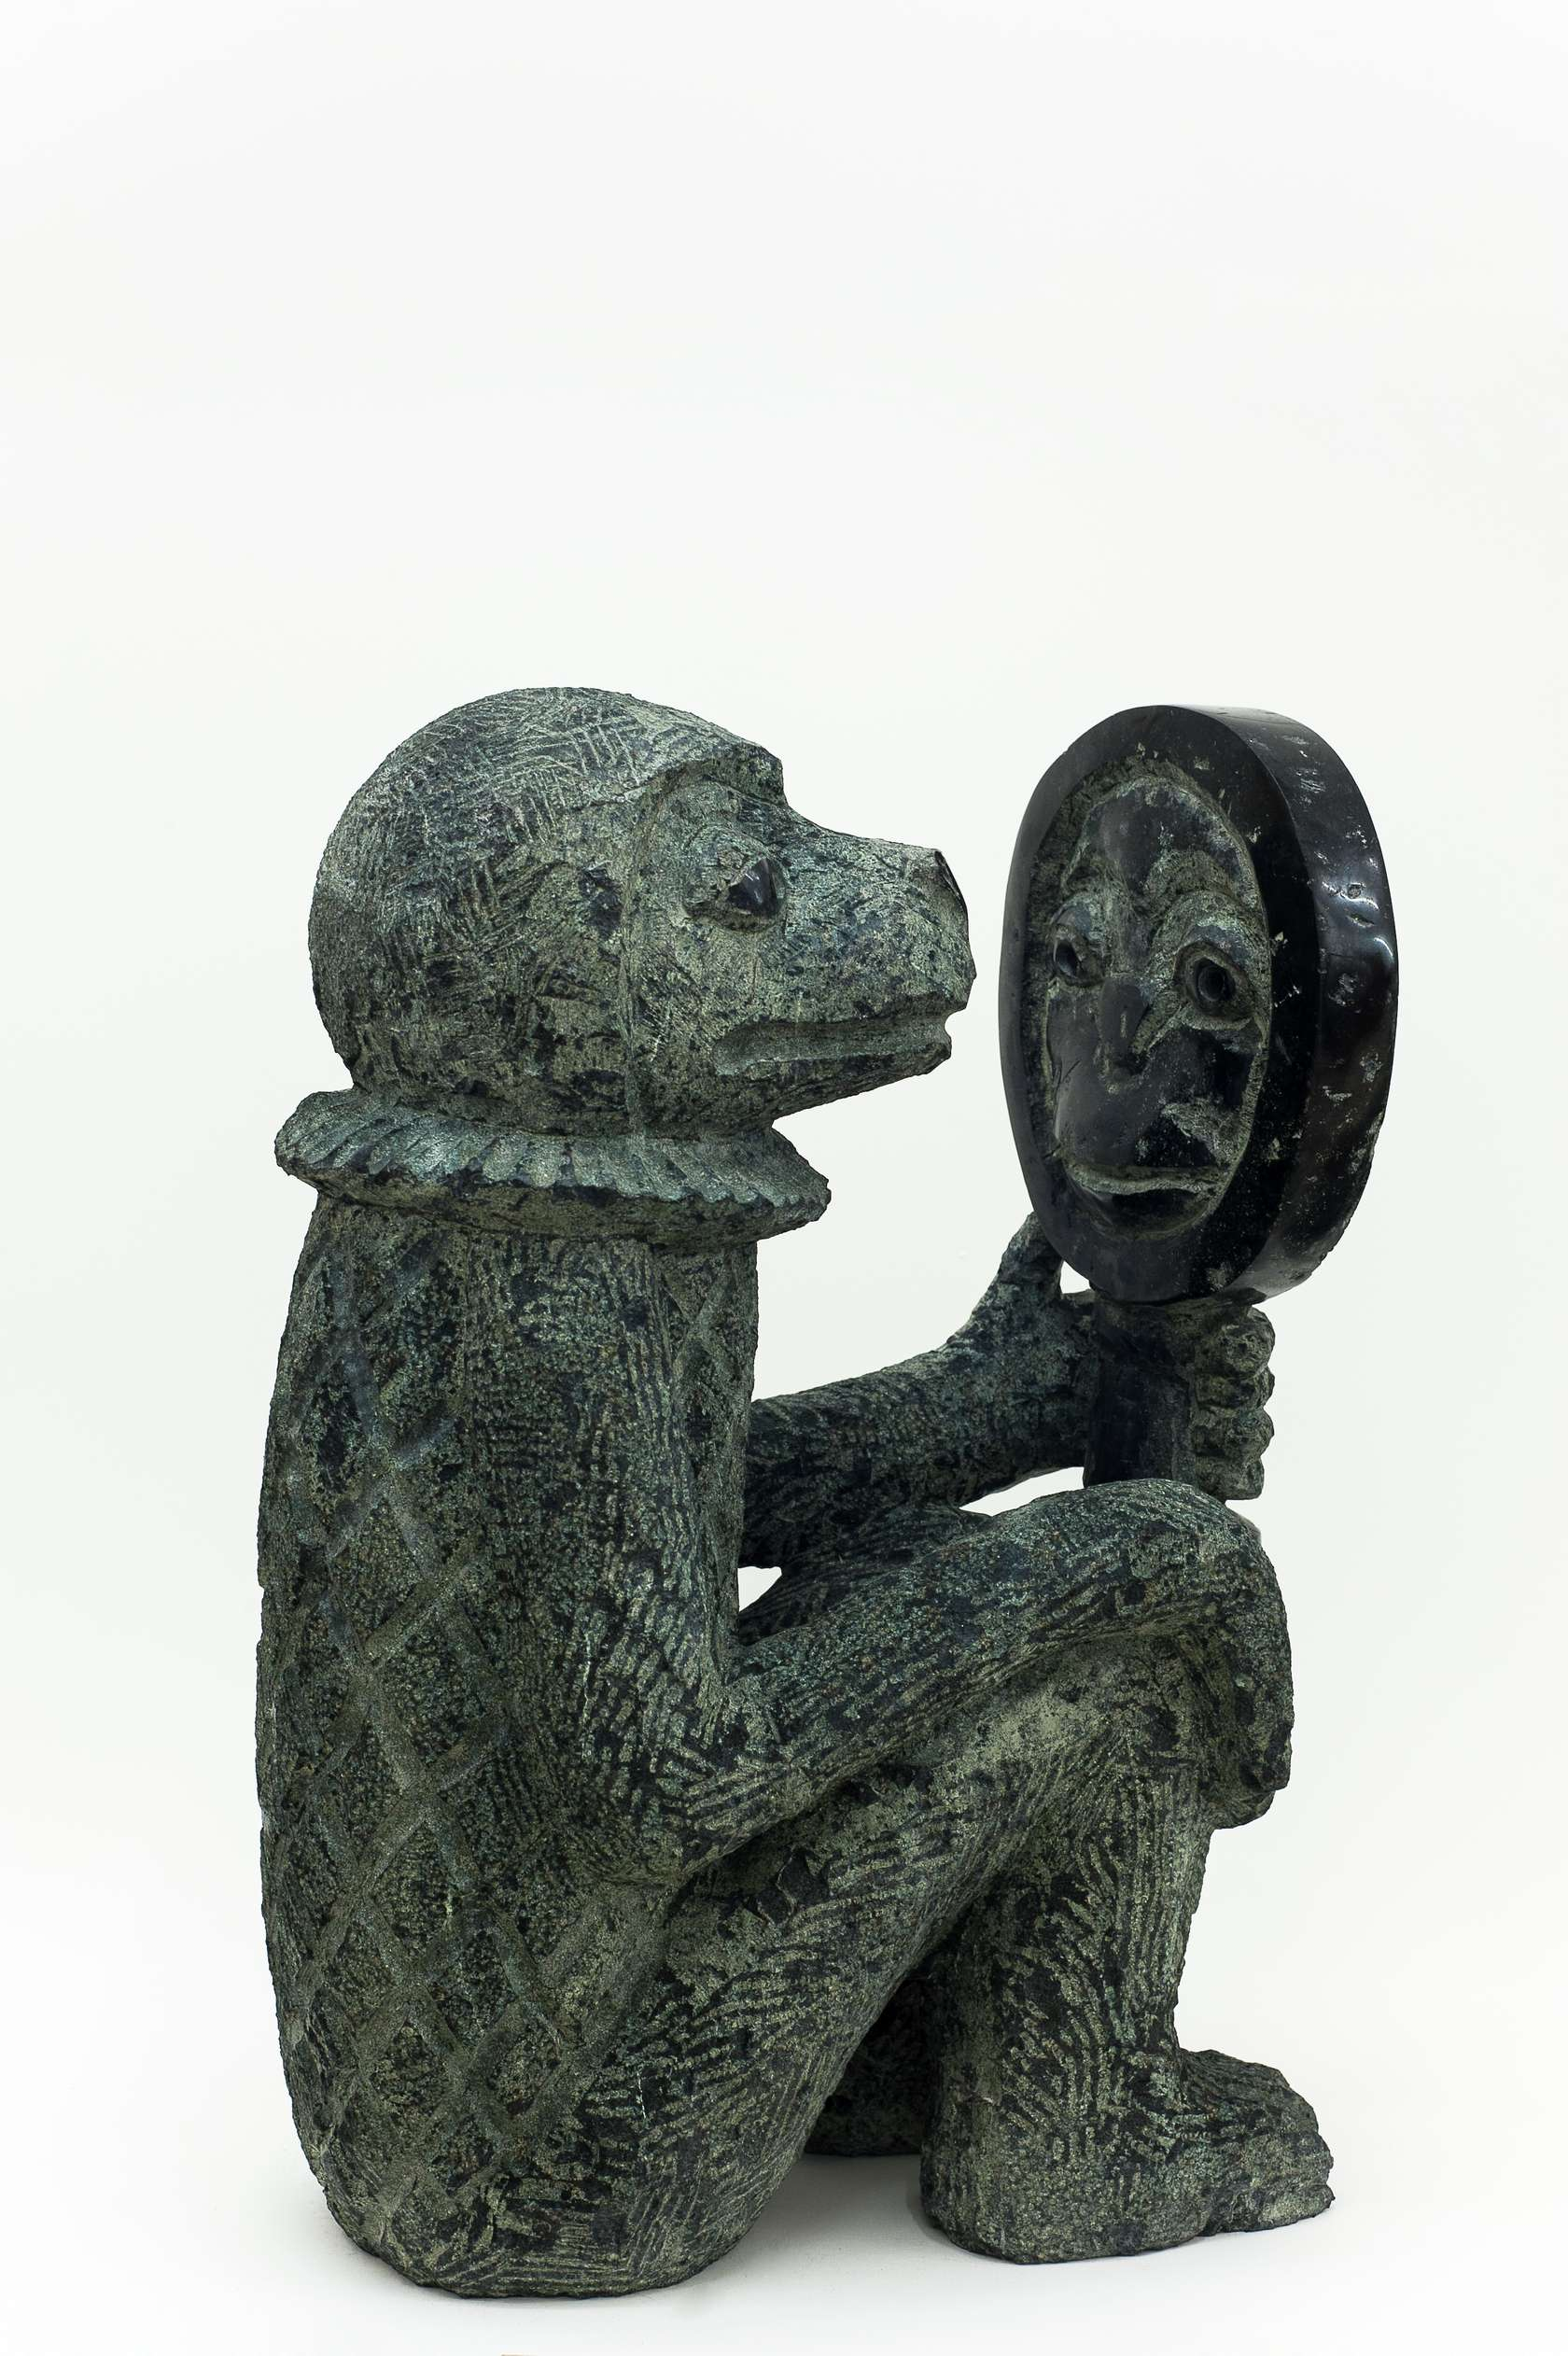 Stefan Rinck, Ape with Mirror, 2015 Diabase50 × 36 × 22 cm / 19 5/8 × 14 1/8 × 8 5/8 in.